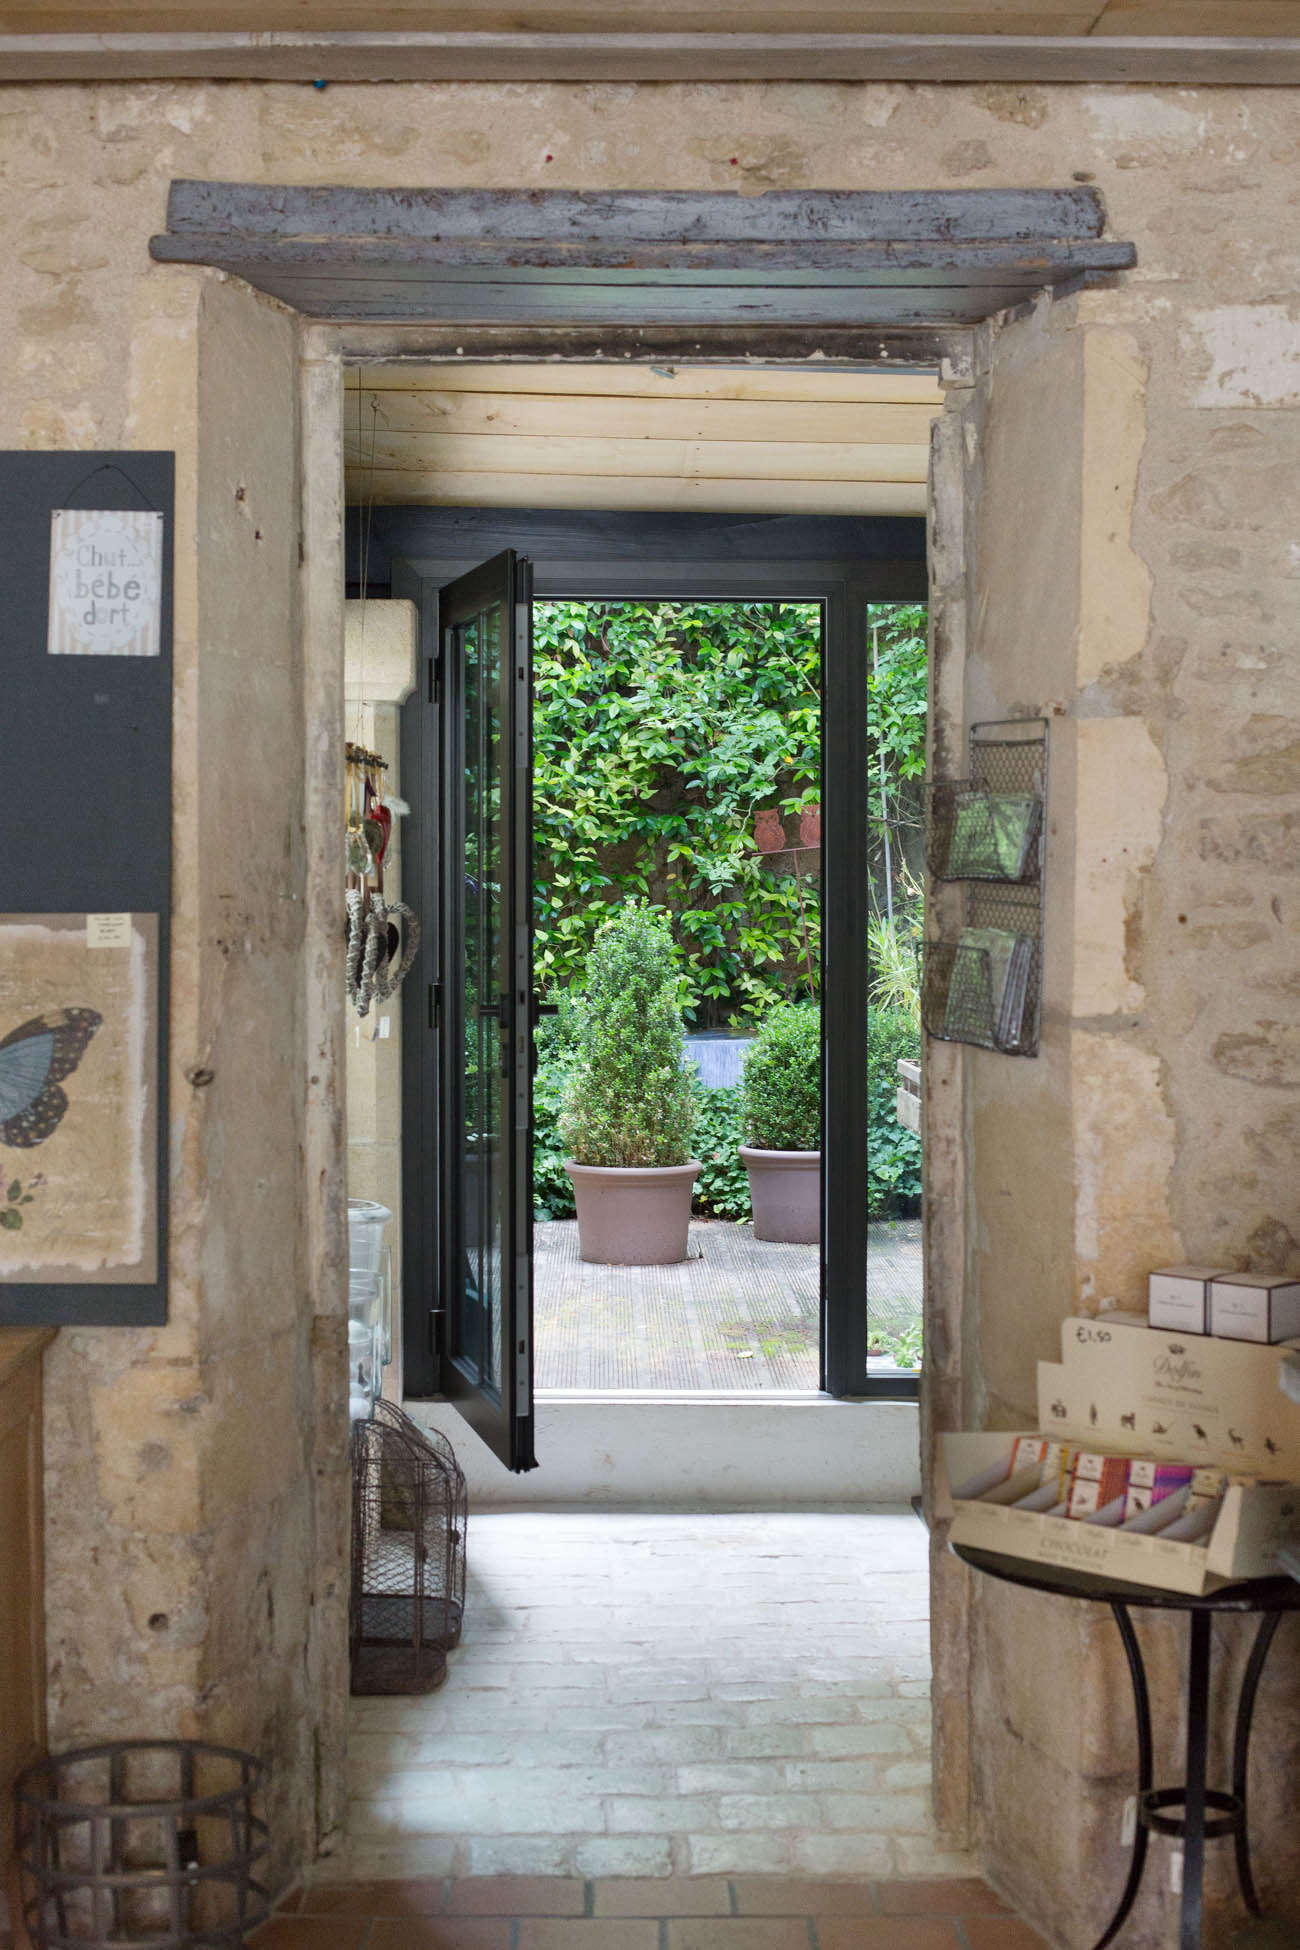 Ambre-store-france-mimi-giboin-gardenista-001